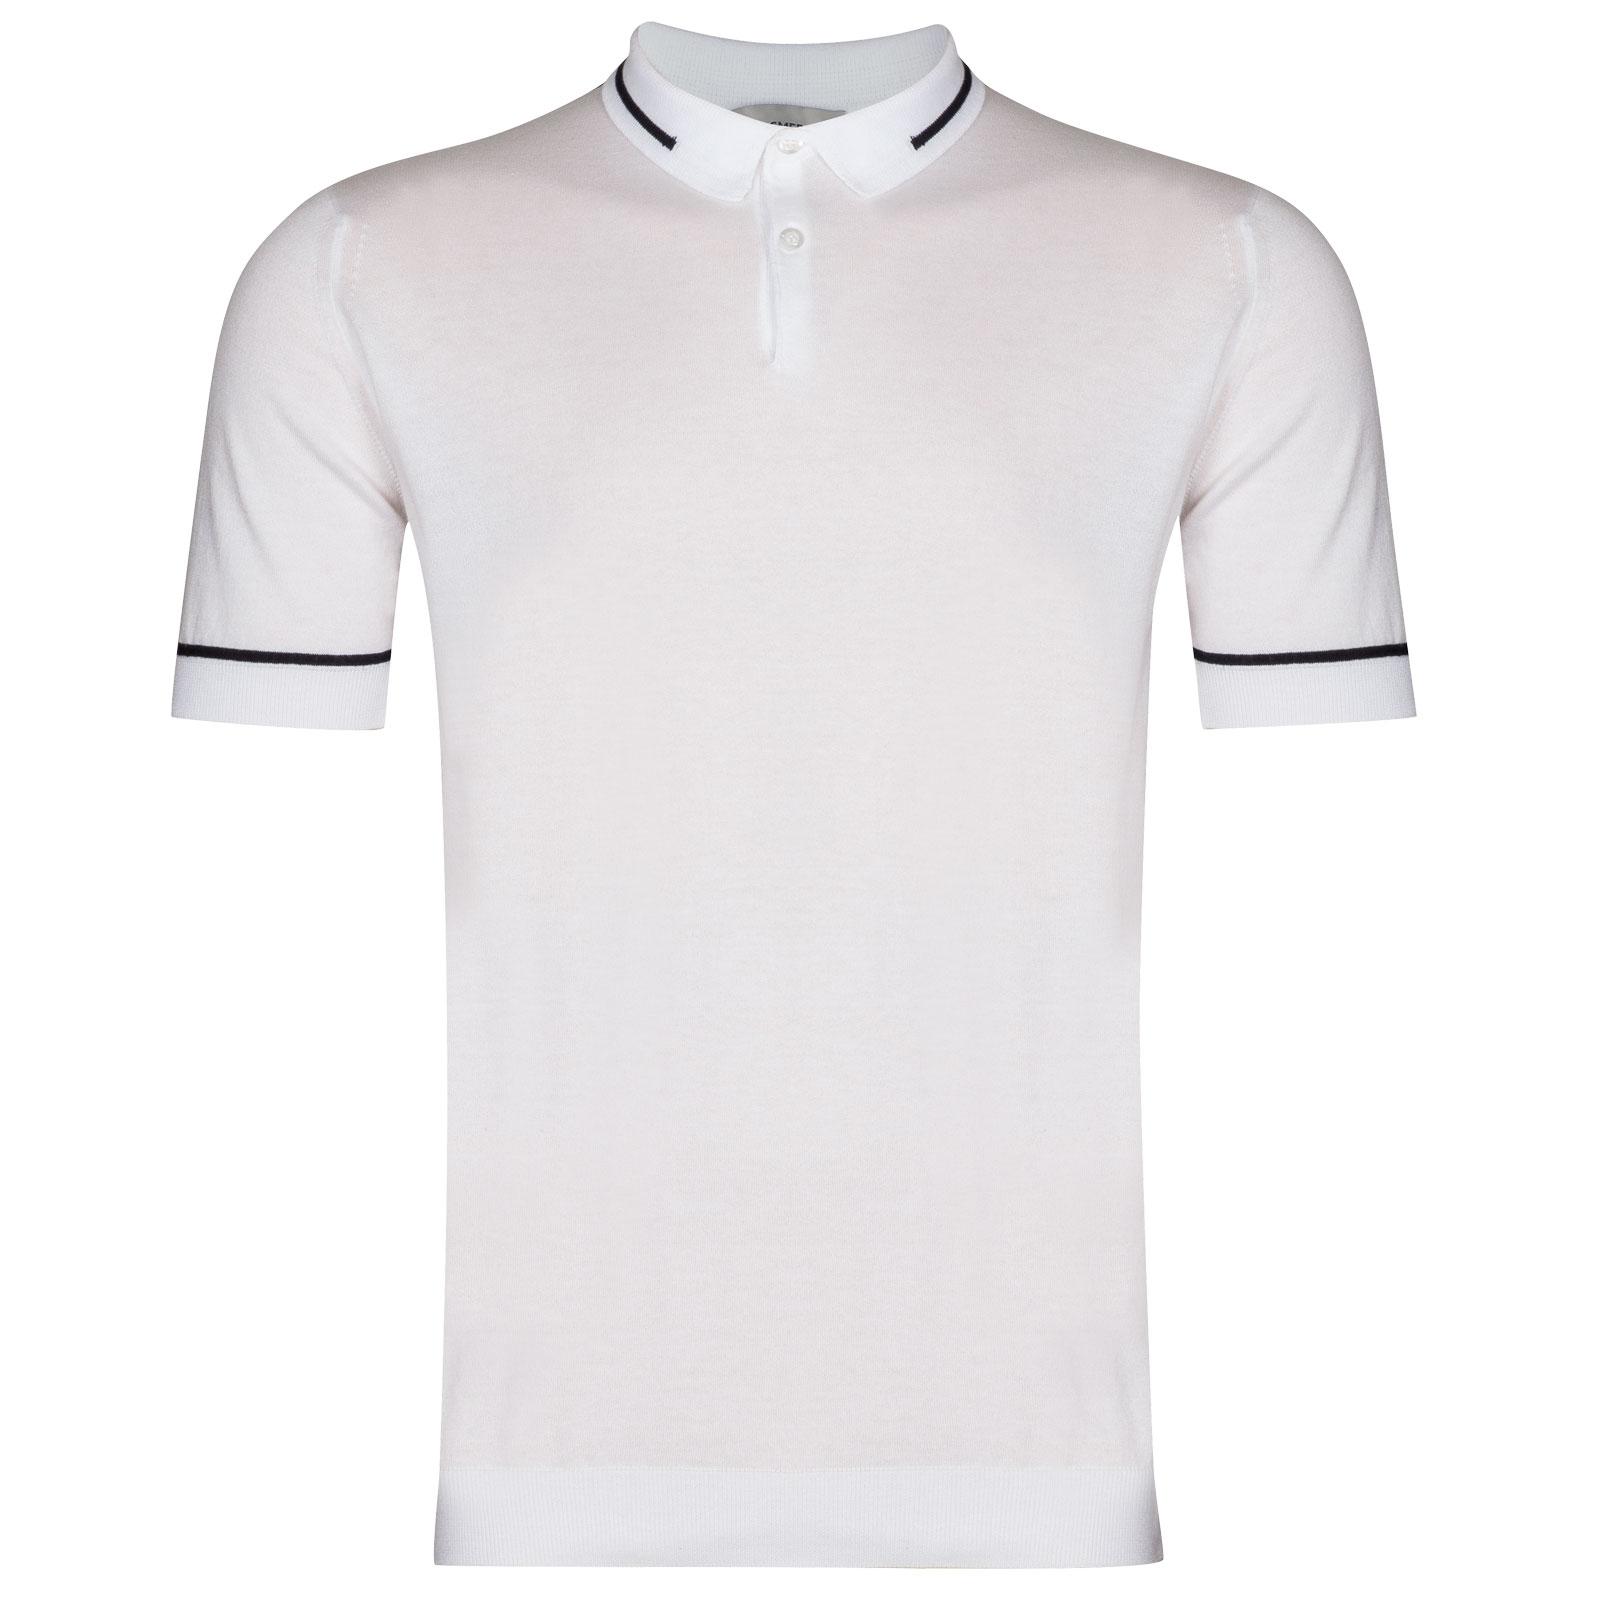 John Smedley Sheldon in White Shirt-XXL